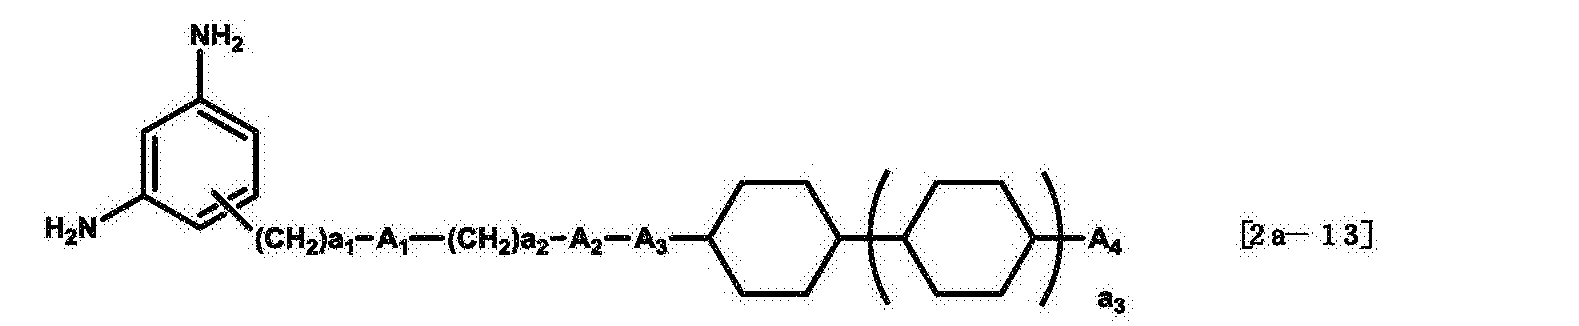 Figure CN105683828AD00164